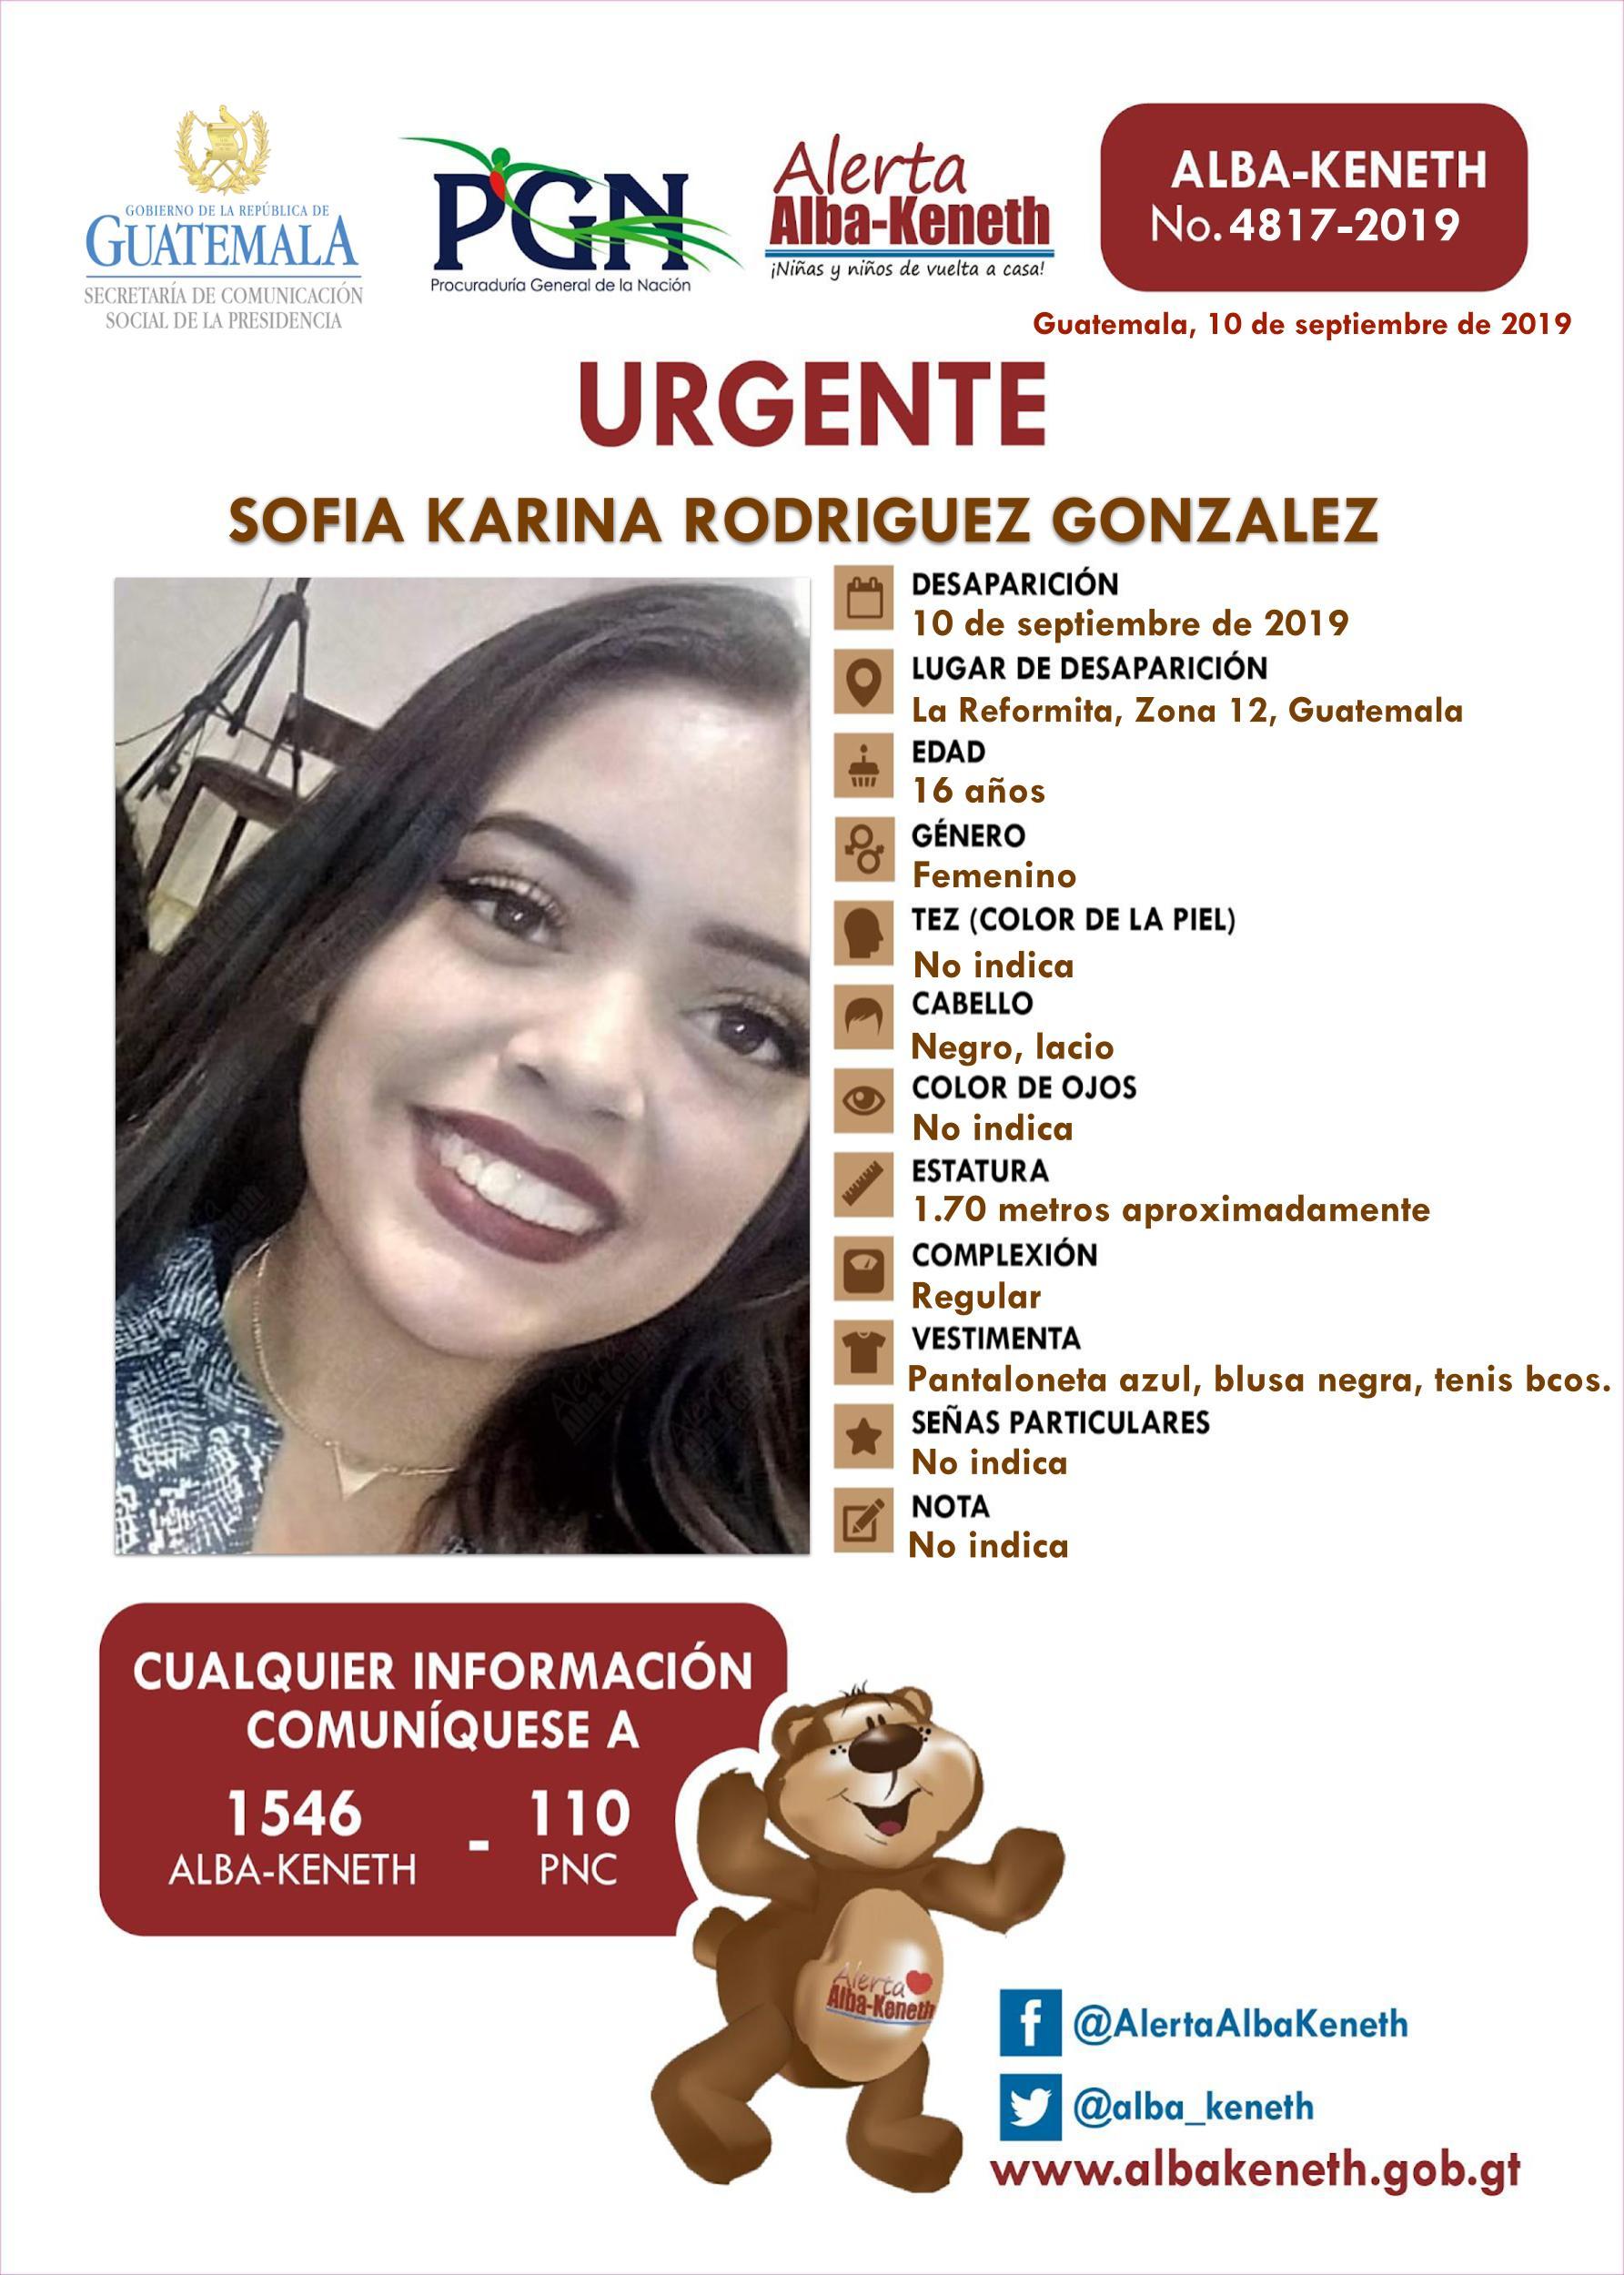 Sofia Karina Rodriguez Gonzalez